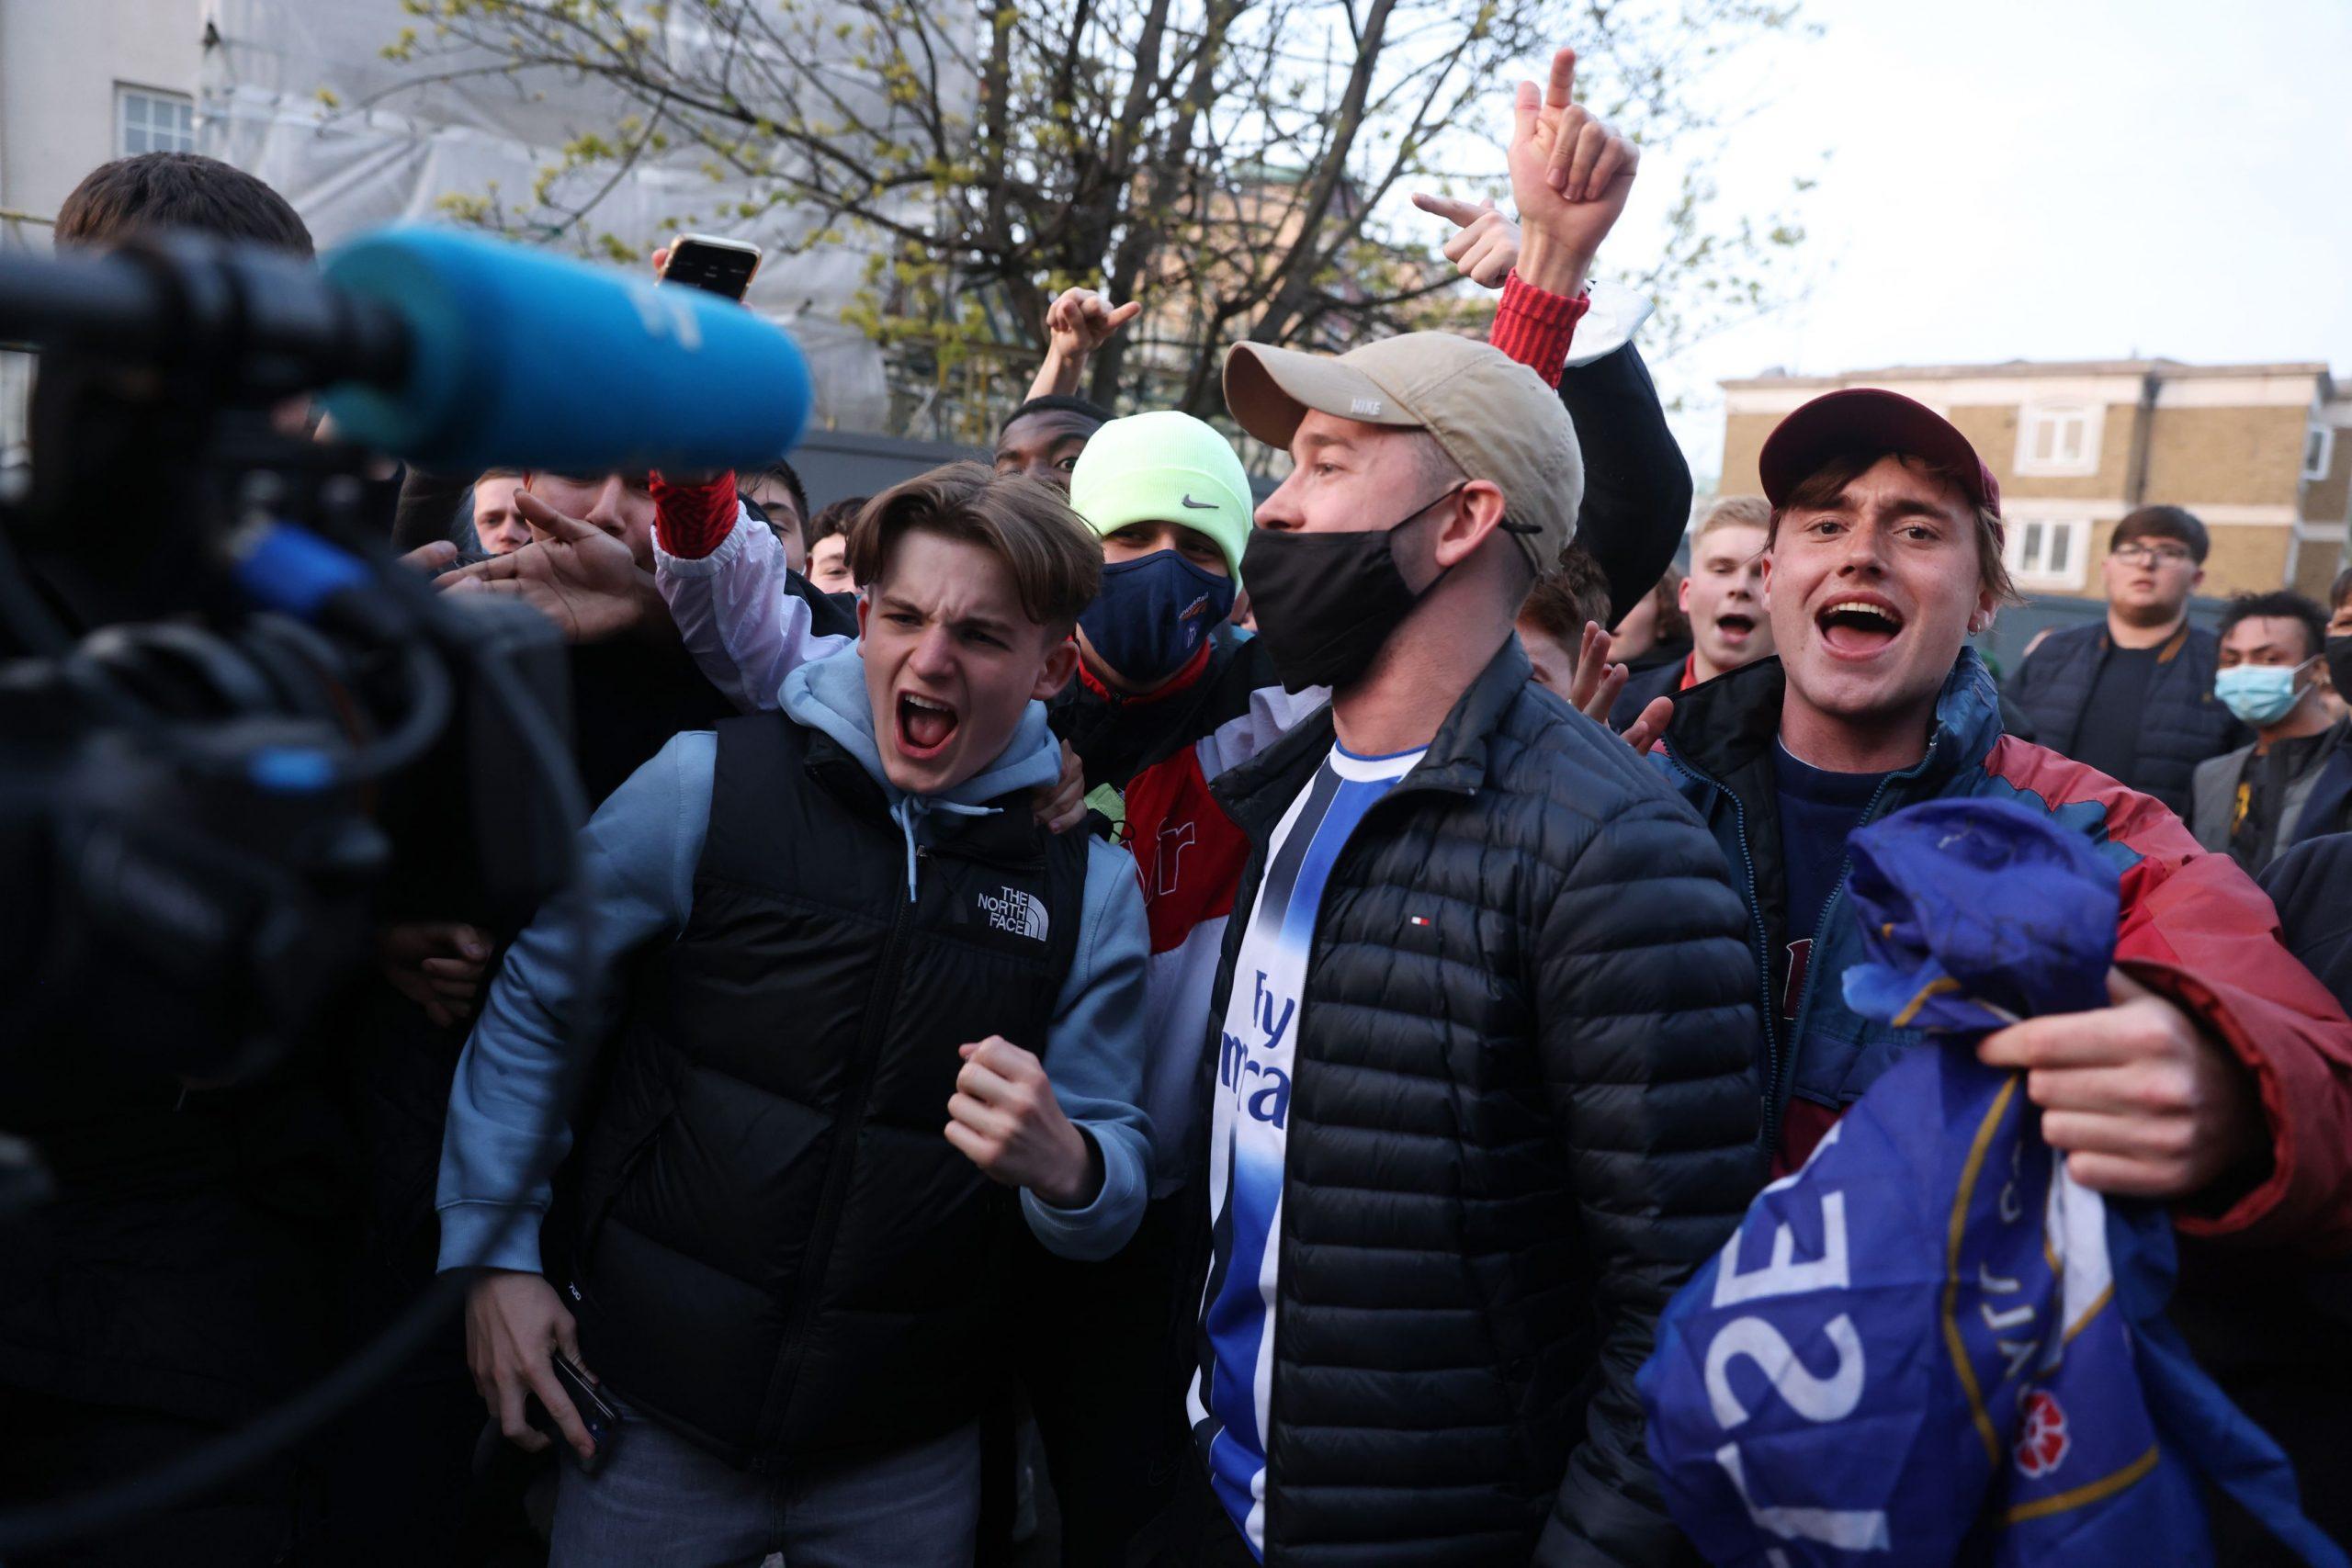 Navijači Chelseaje ispred Stamford Bridgea/Foto REUTERS